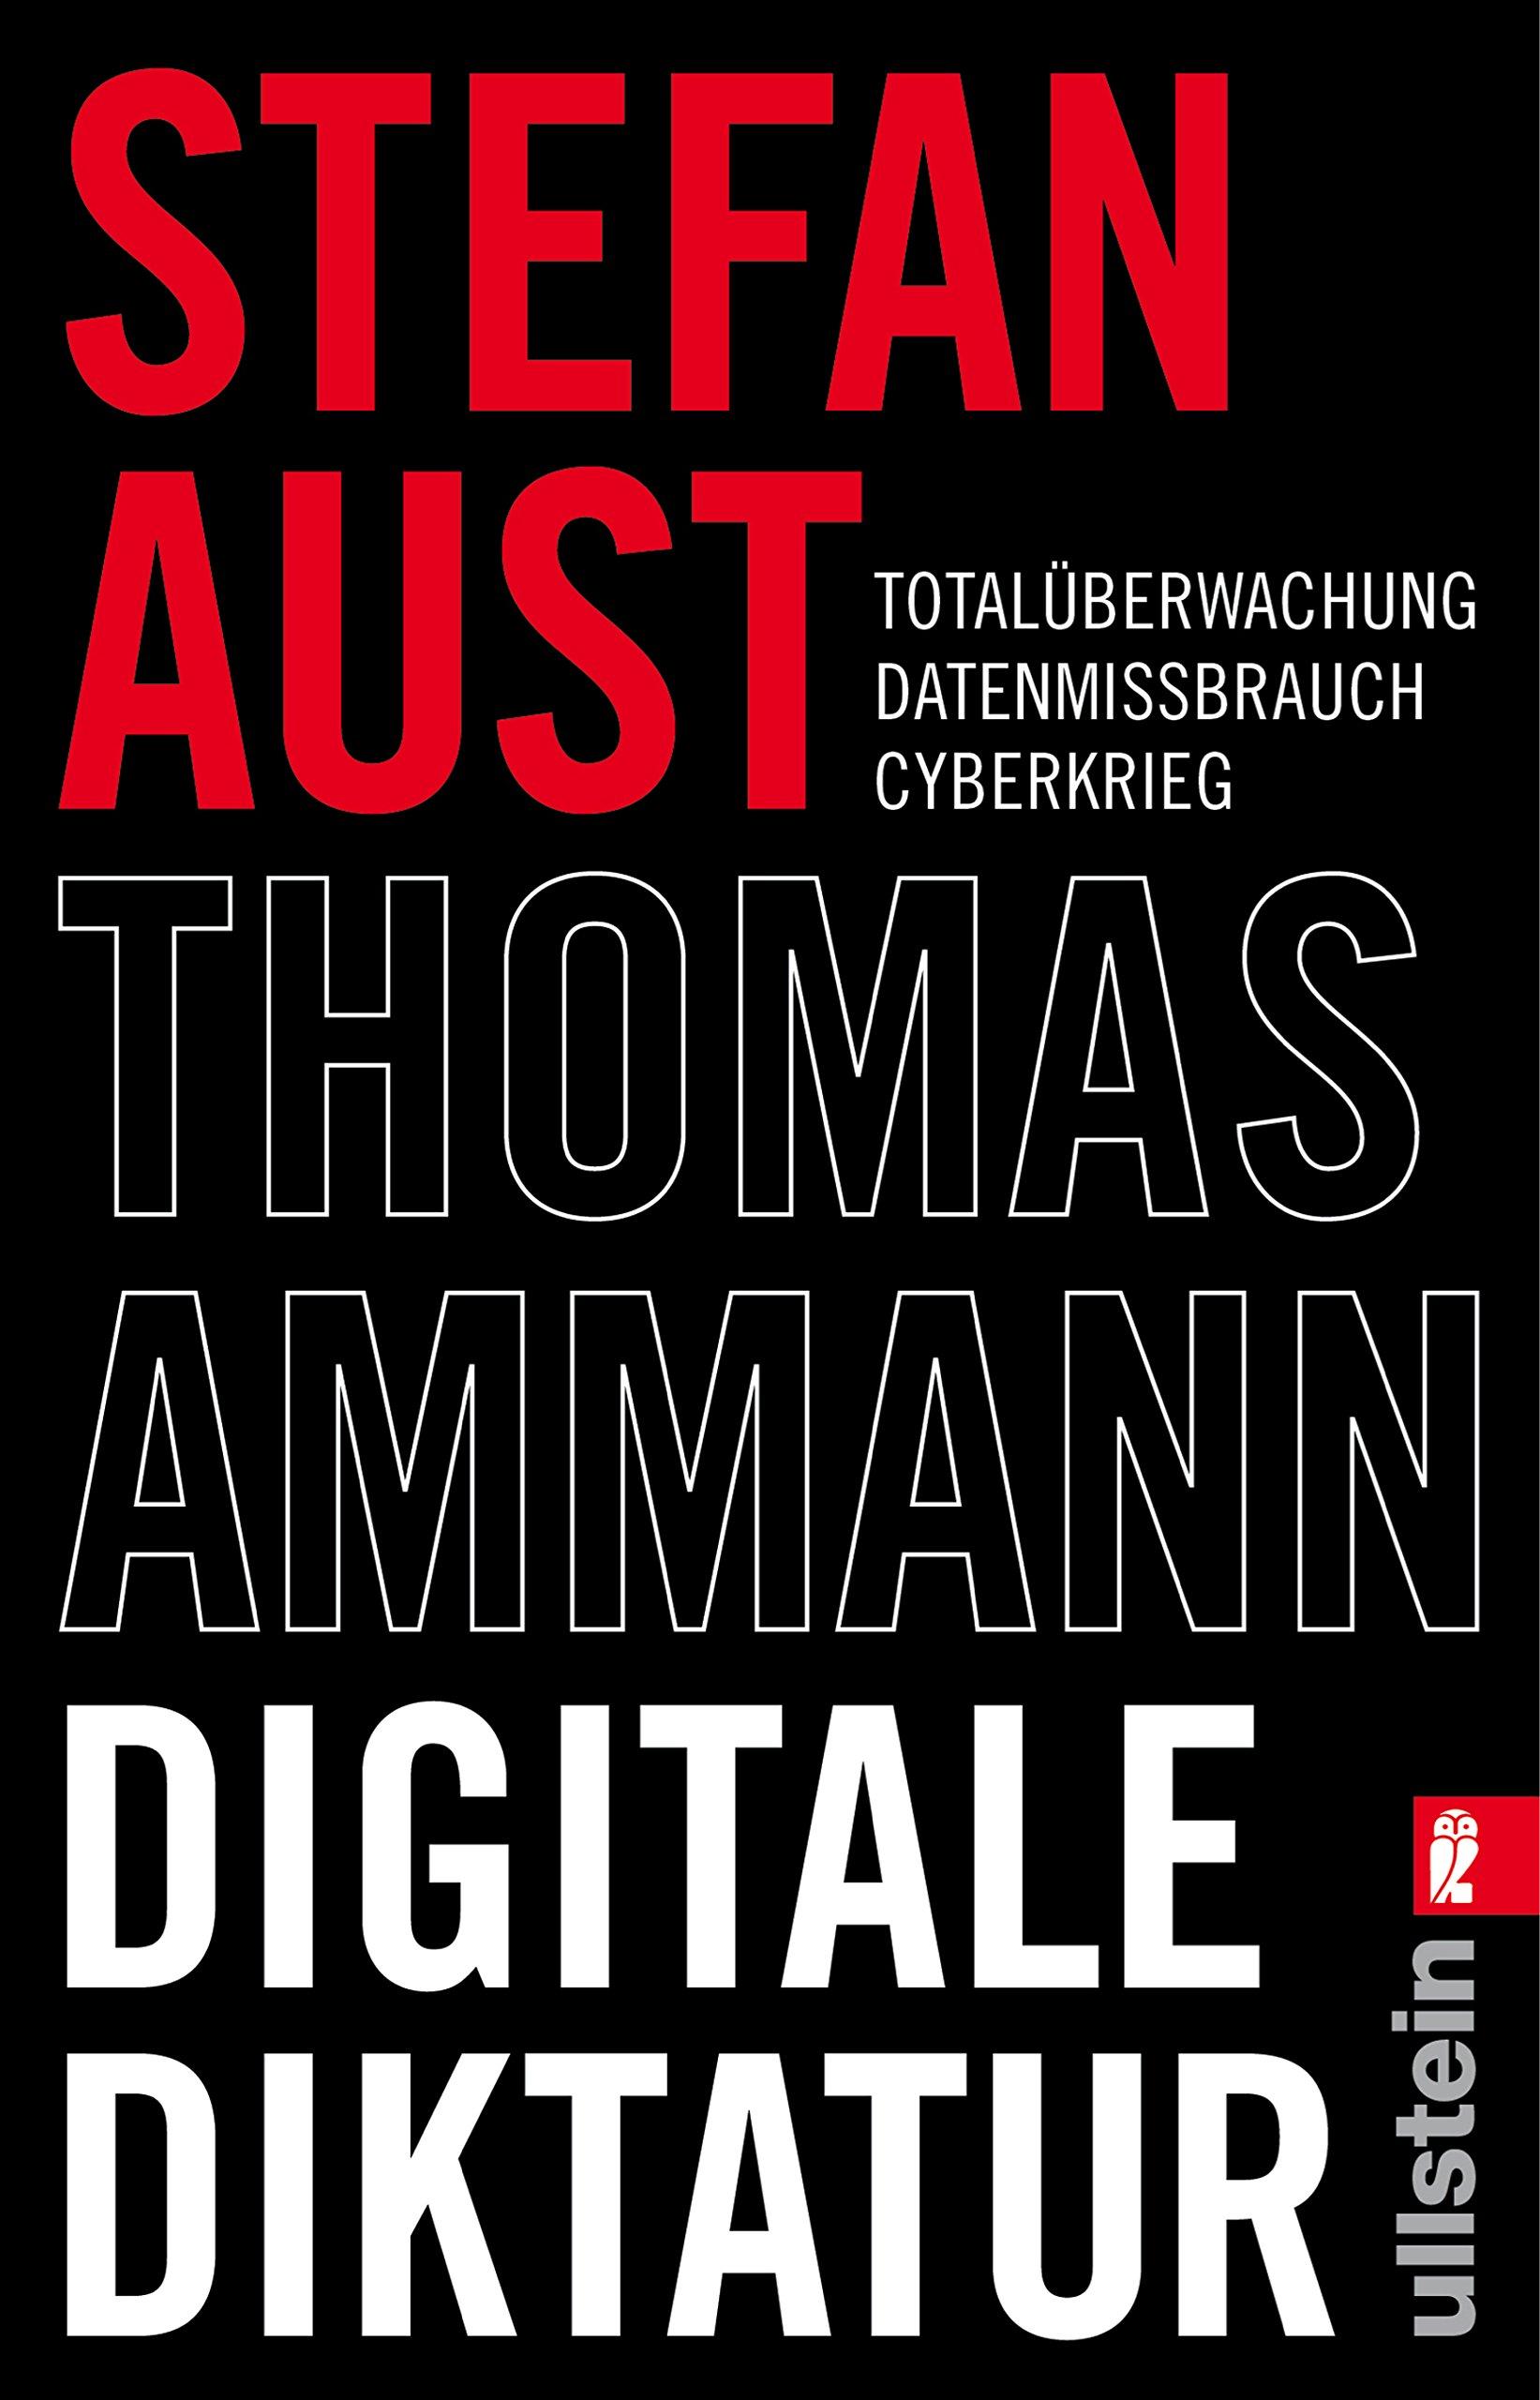 Digitale Diktatur: Totalüberwachung Datenmissbrauch Cyberkrieg